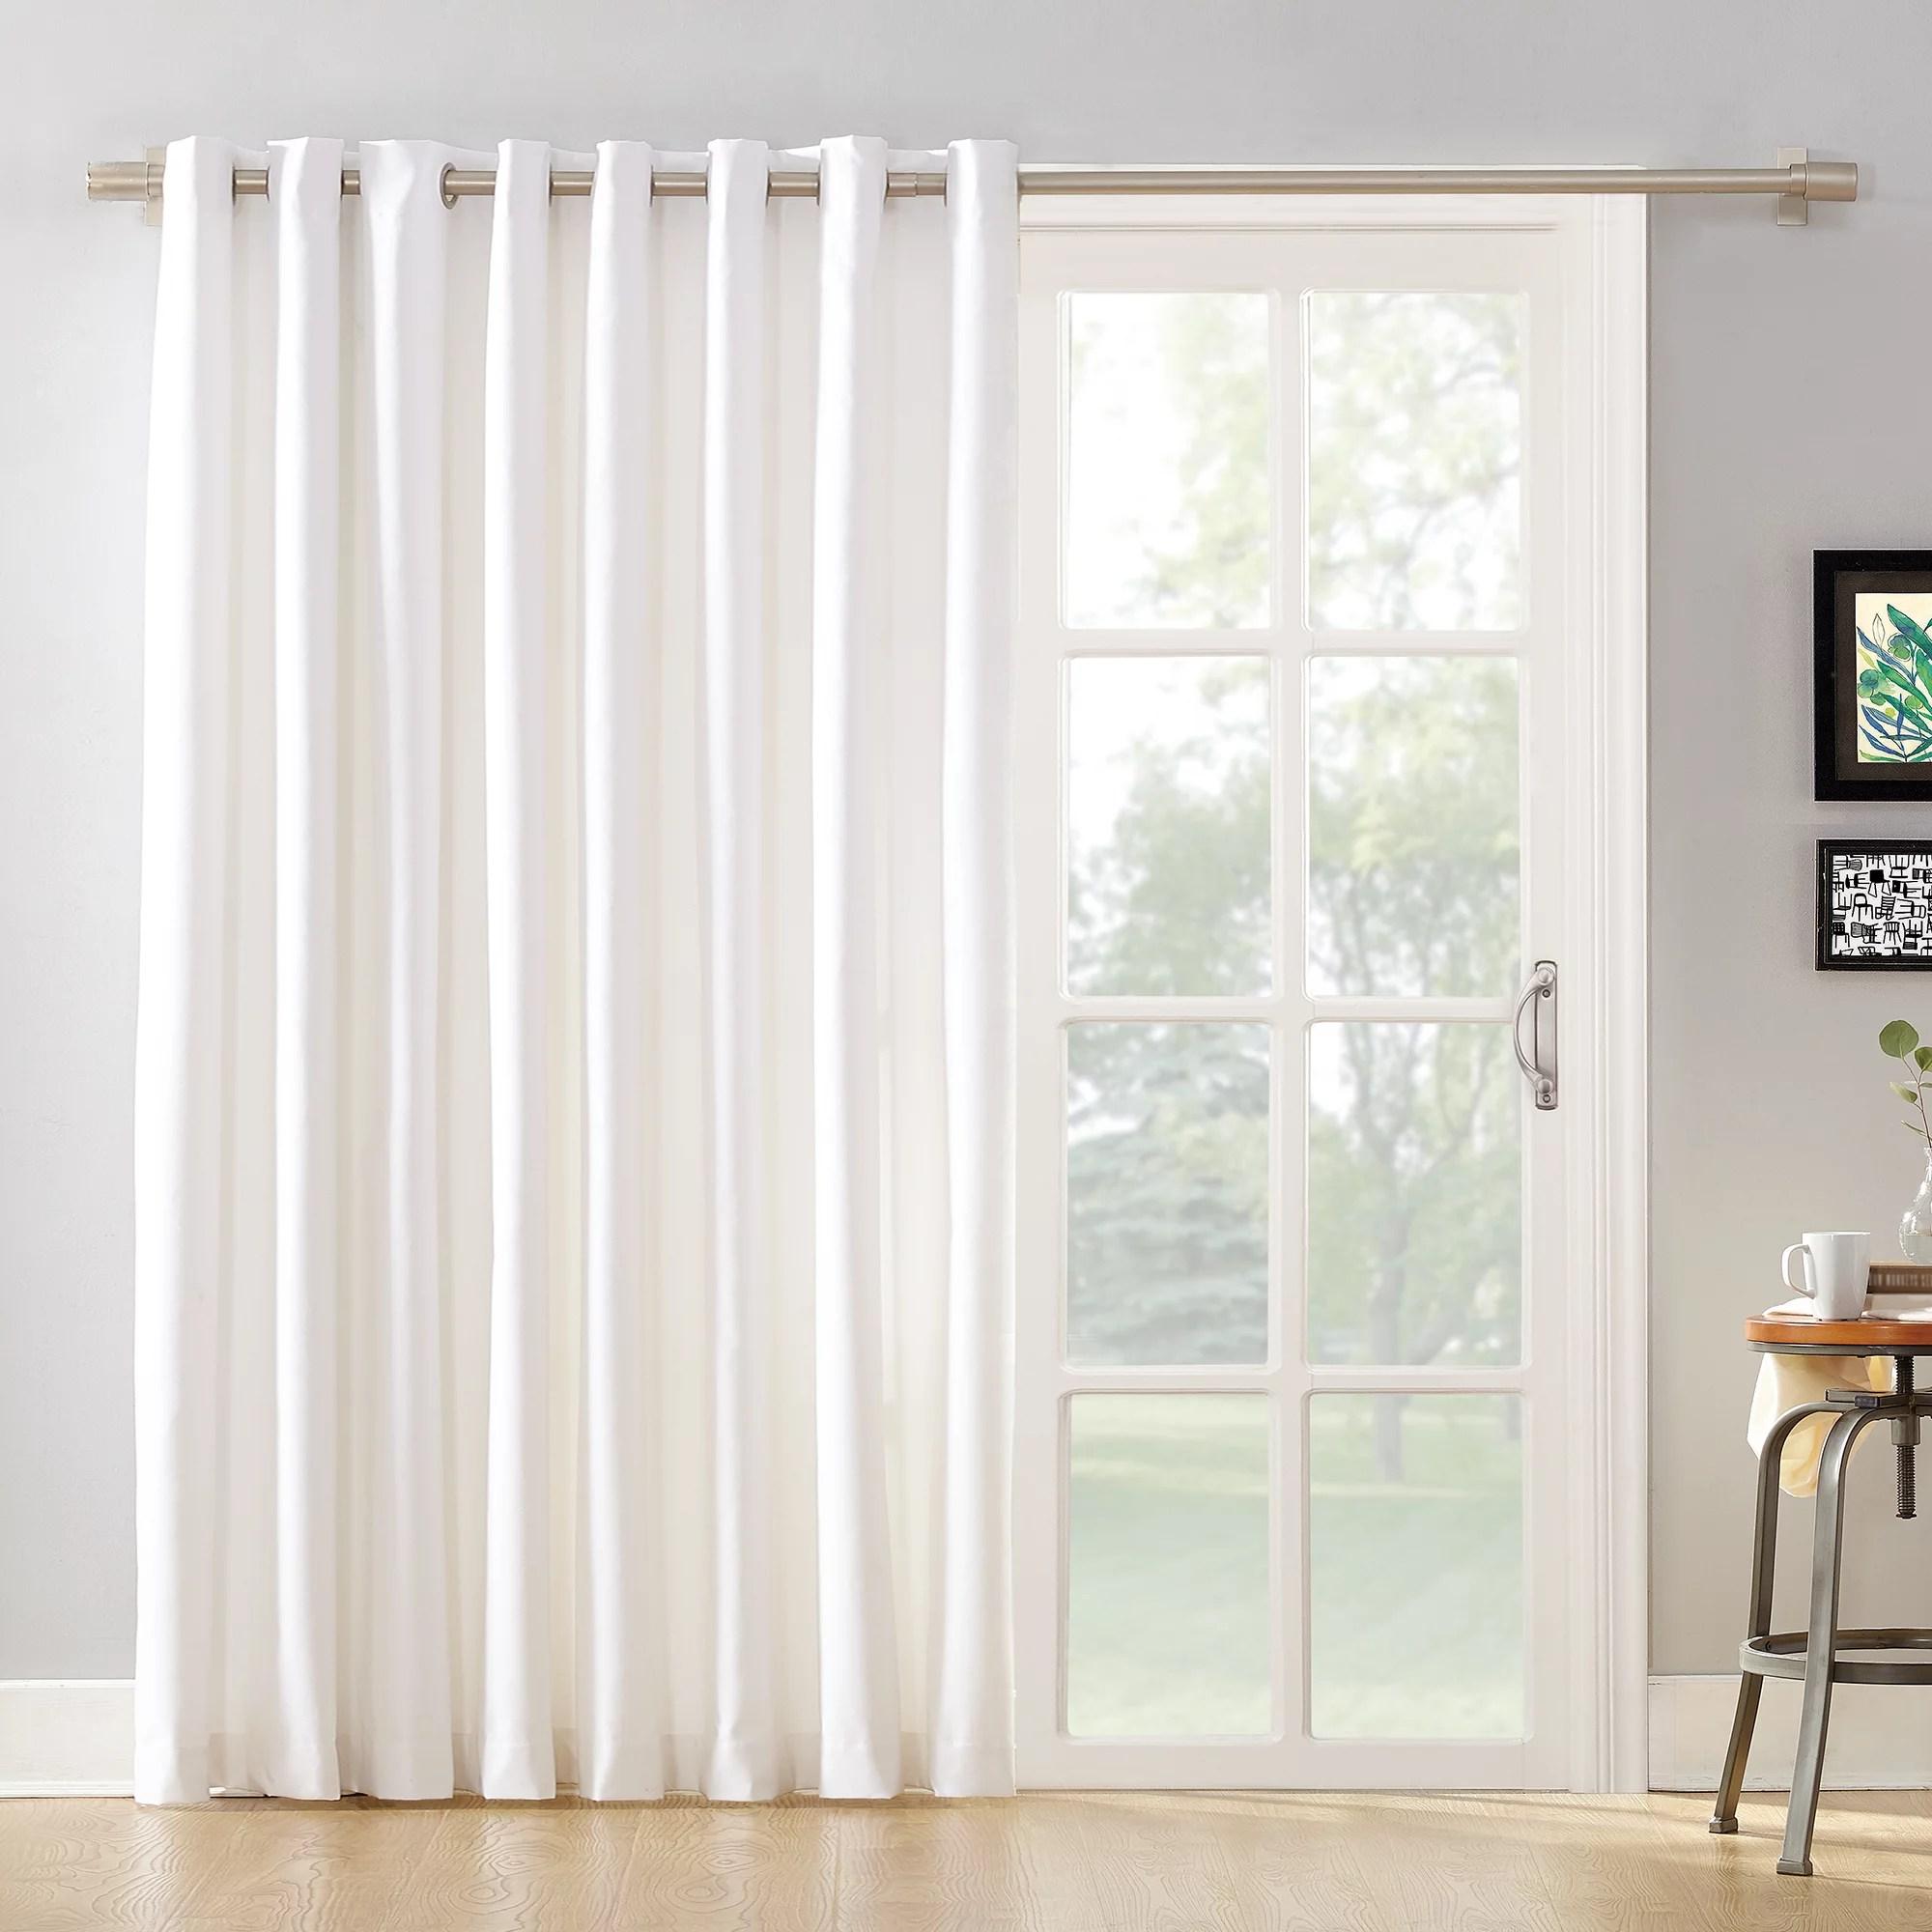 Mainstays Sliding Glass Door Thermal Lined Room Darkening Grommet Curtain Panel Walmart Com Walmart Com